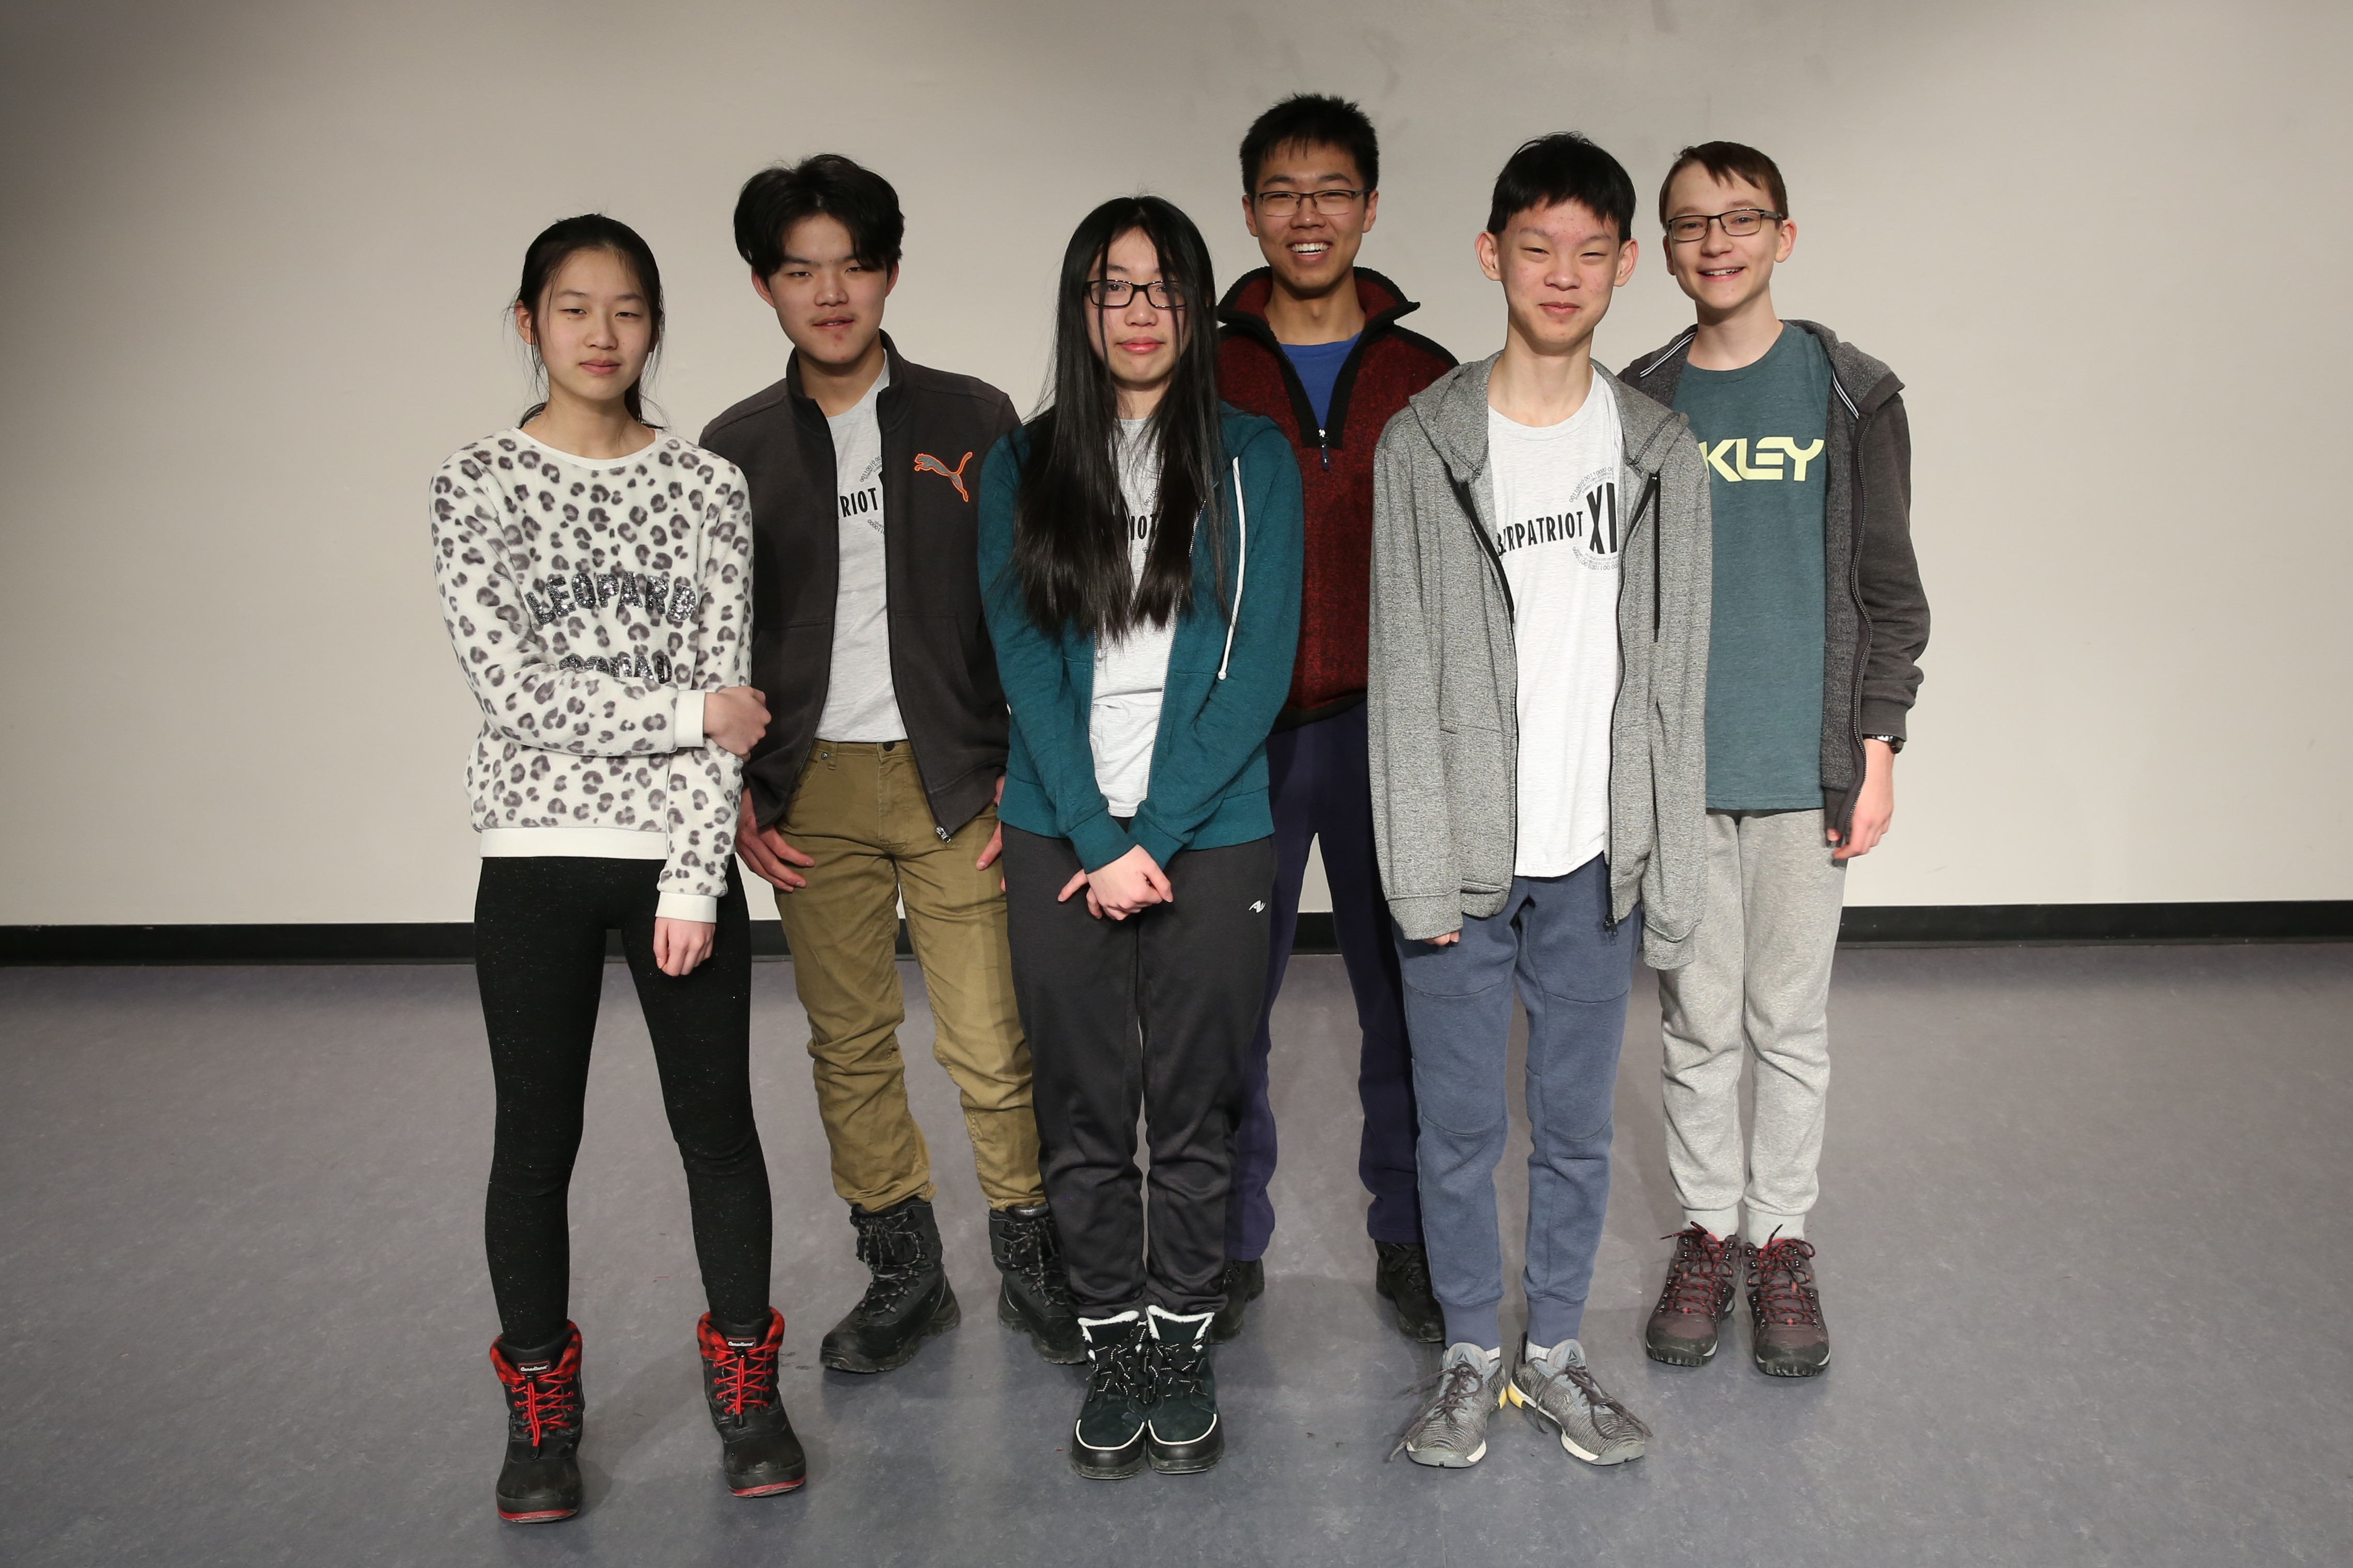 Meet the CyberTitans: Team 404_not_found